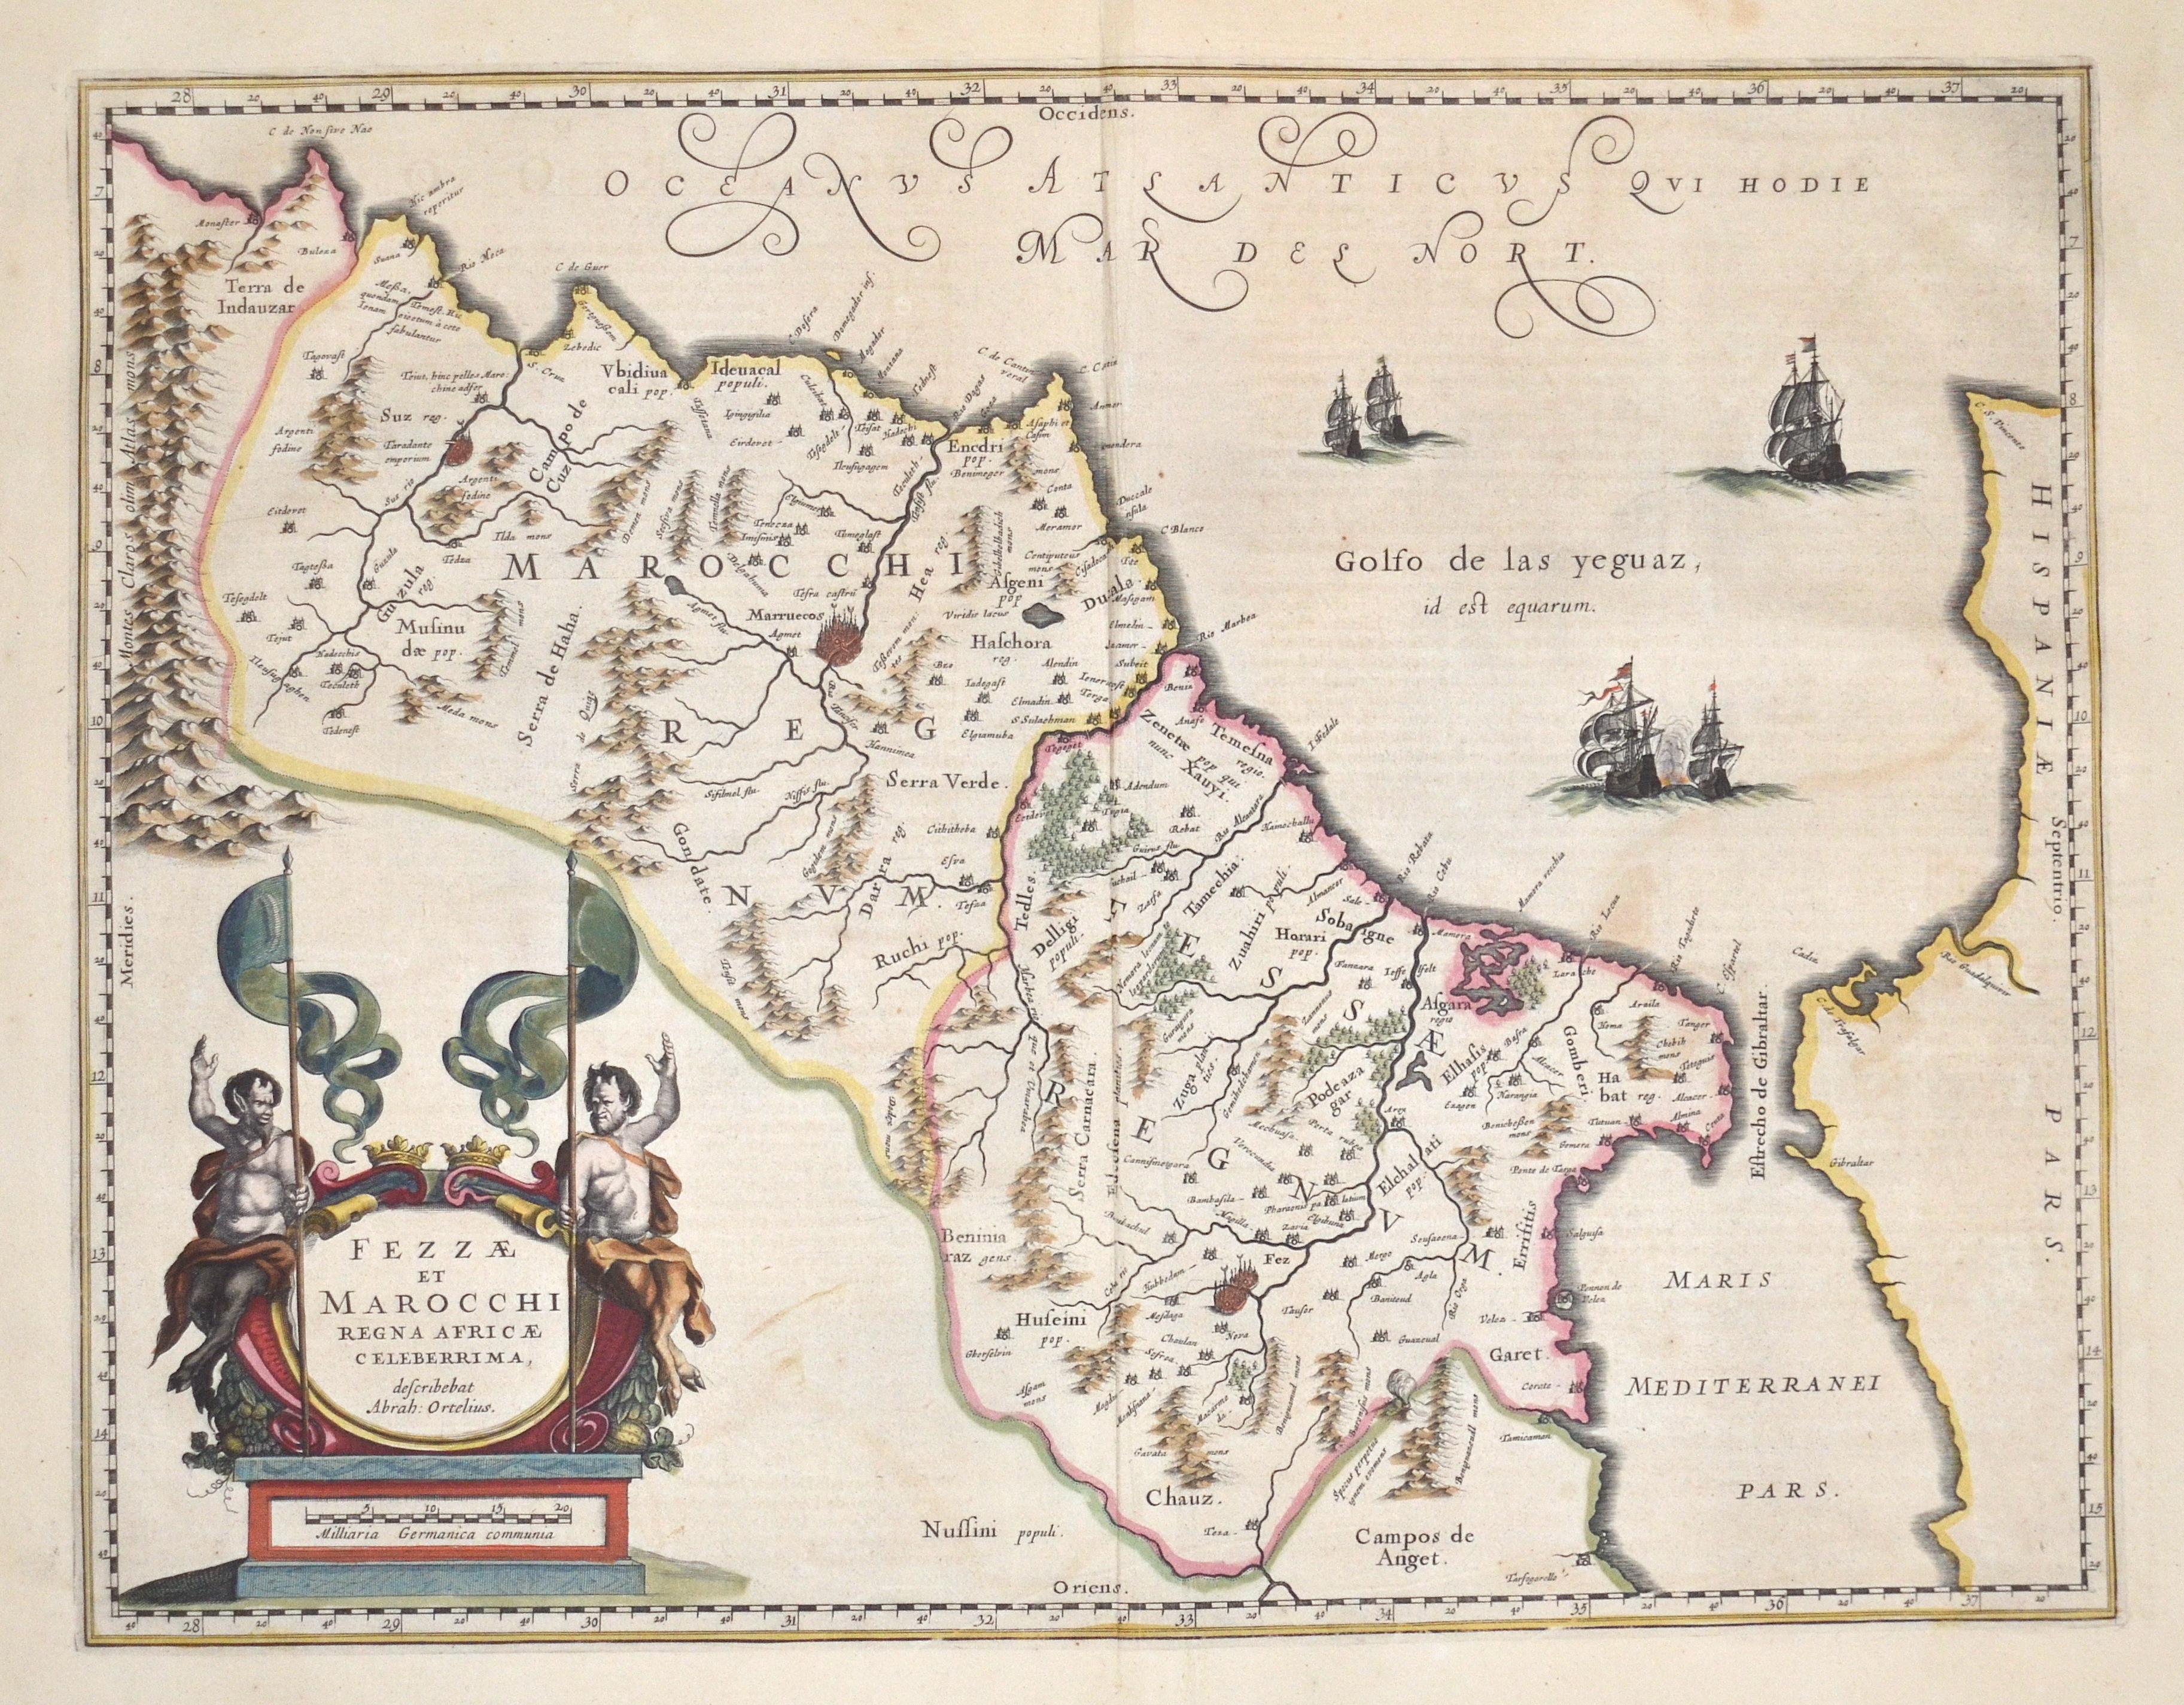 Blaeu Willem Janszoon Fezzae et Marocchi Regna Africae celeberrima, describebat Abrah: Ortelius.